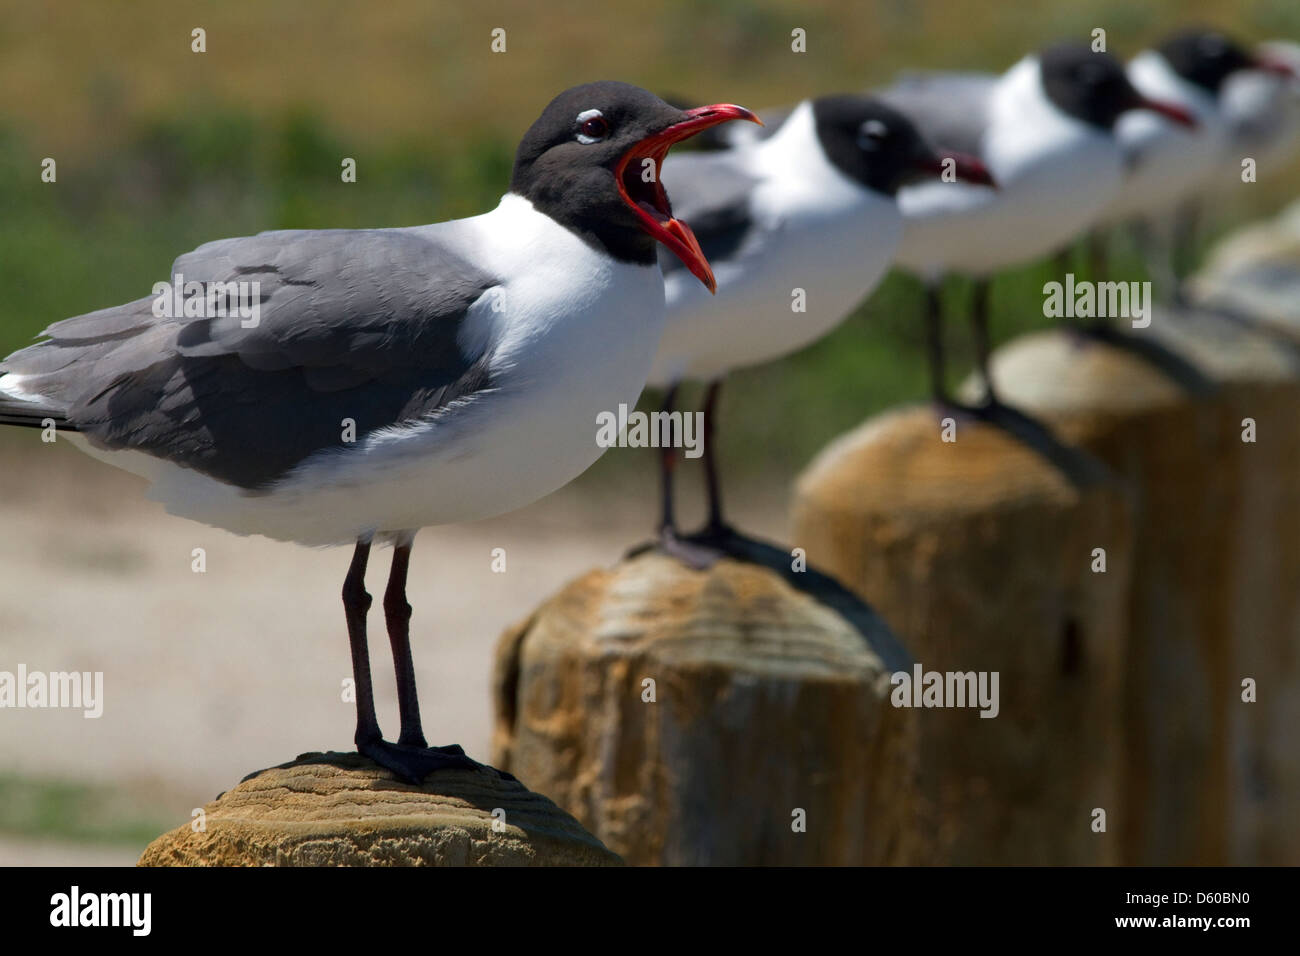 Laughing Gull at the bay of Corpus Christi, Texas, USA. - Stock Image